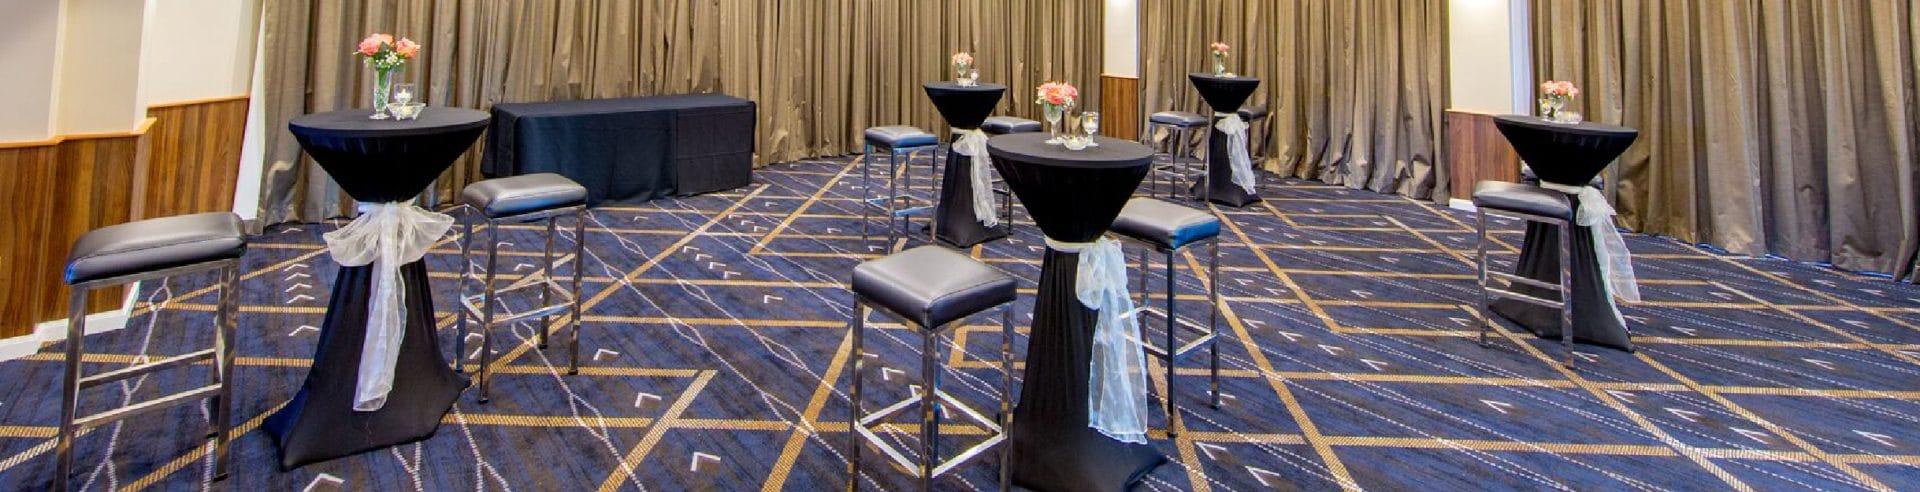 Wynnum Room Private Function at Tingalpa Hotel